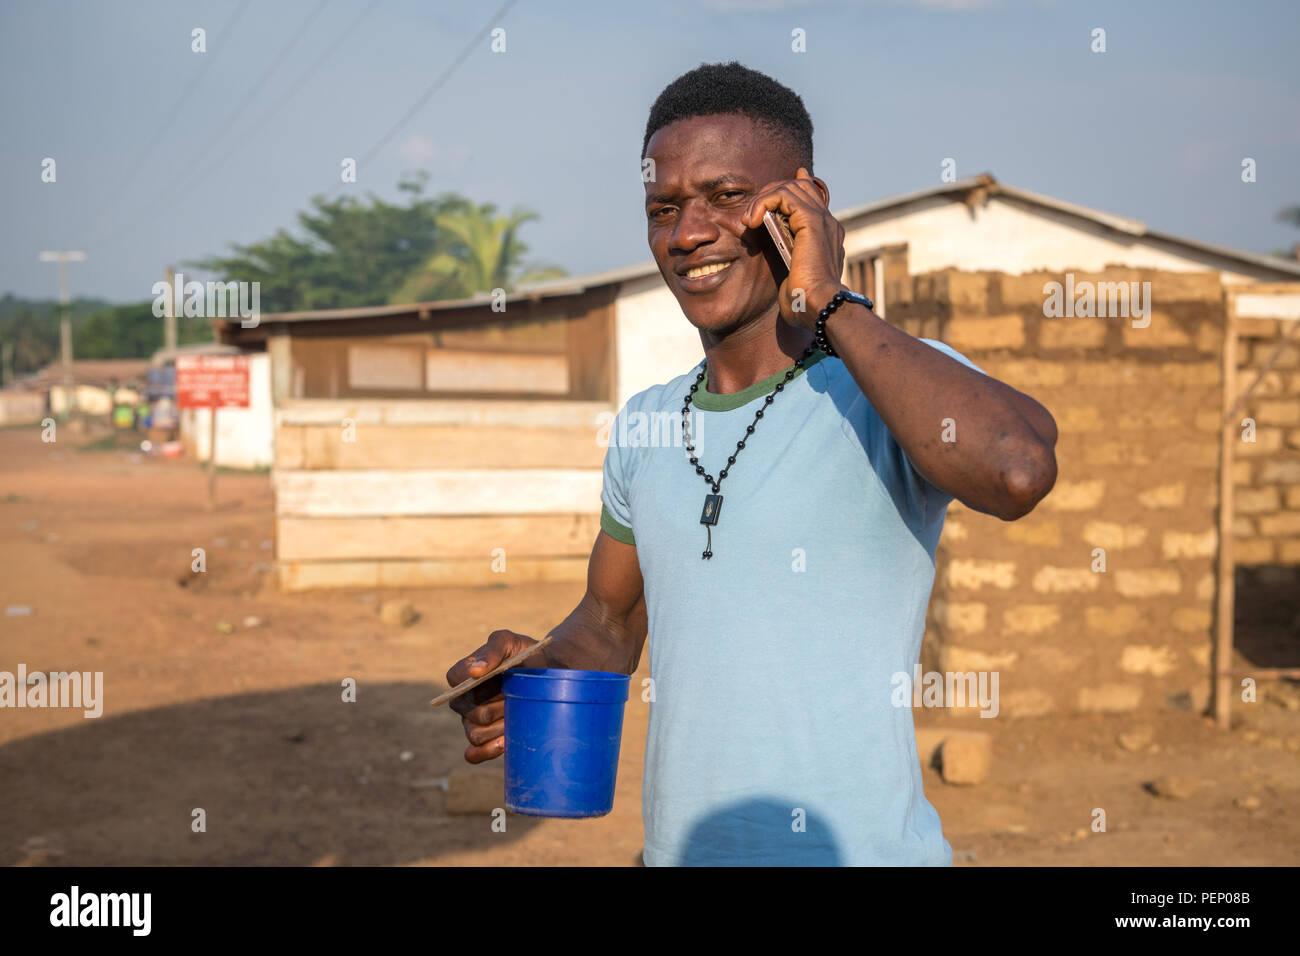 A man on his phone smiles for the camera Ganta, Liberia - Stock Image